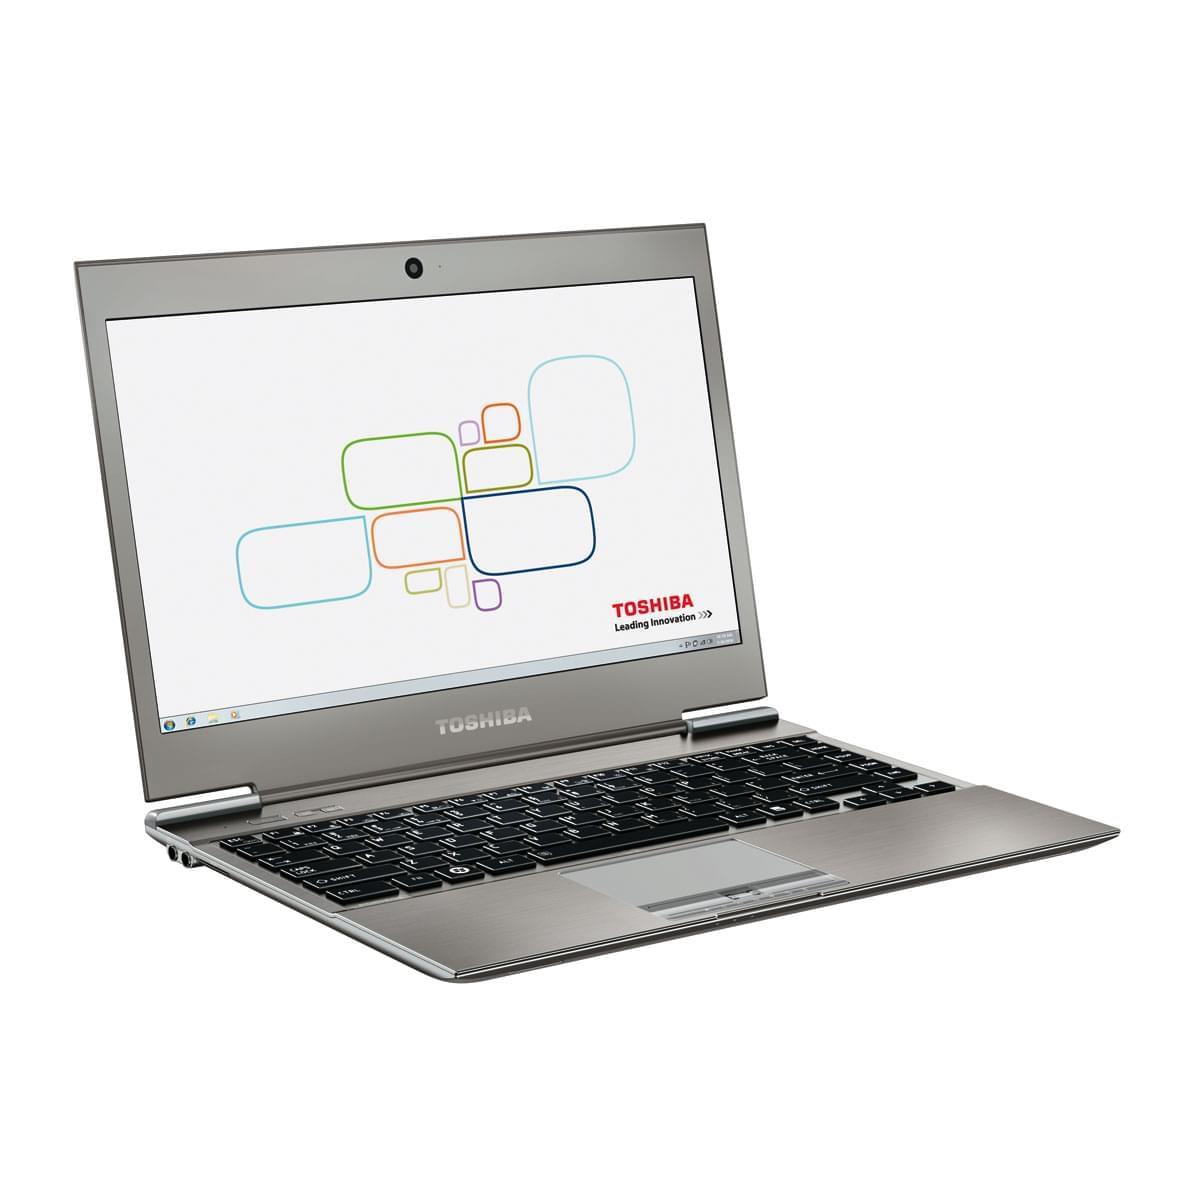 Toshiba PT235E-00E007FR - PC portable Toshiba - Cybertek.fr - 0